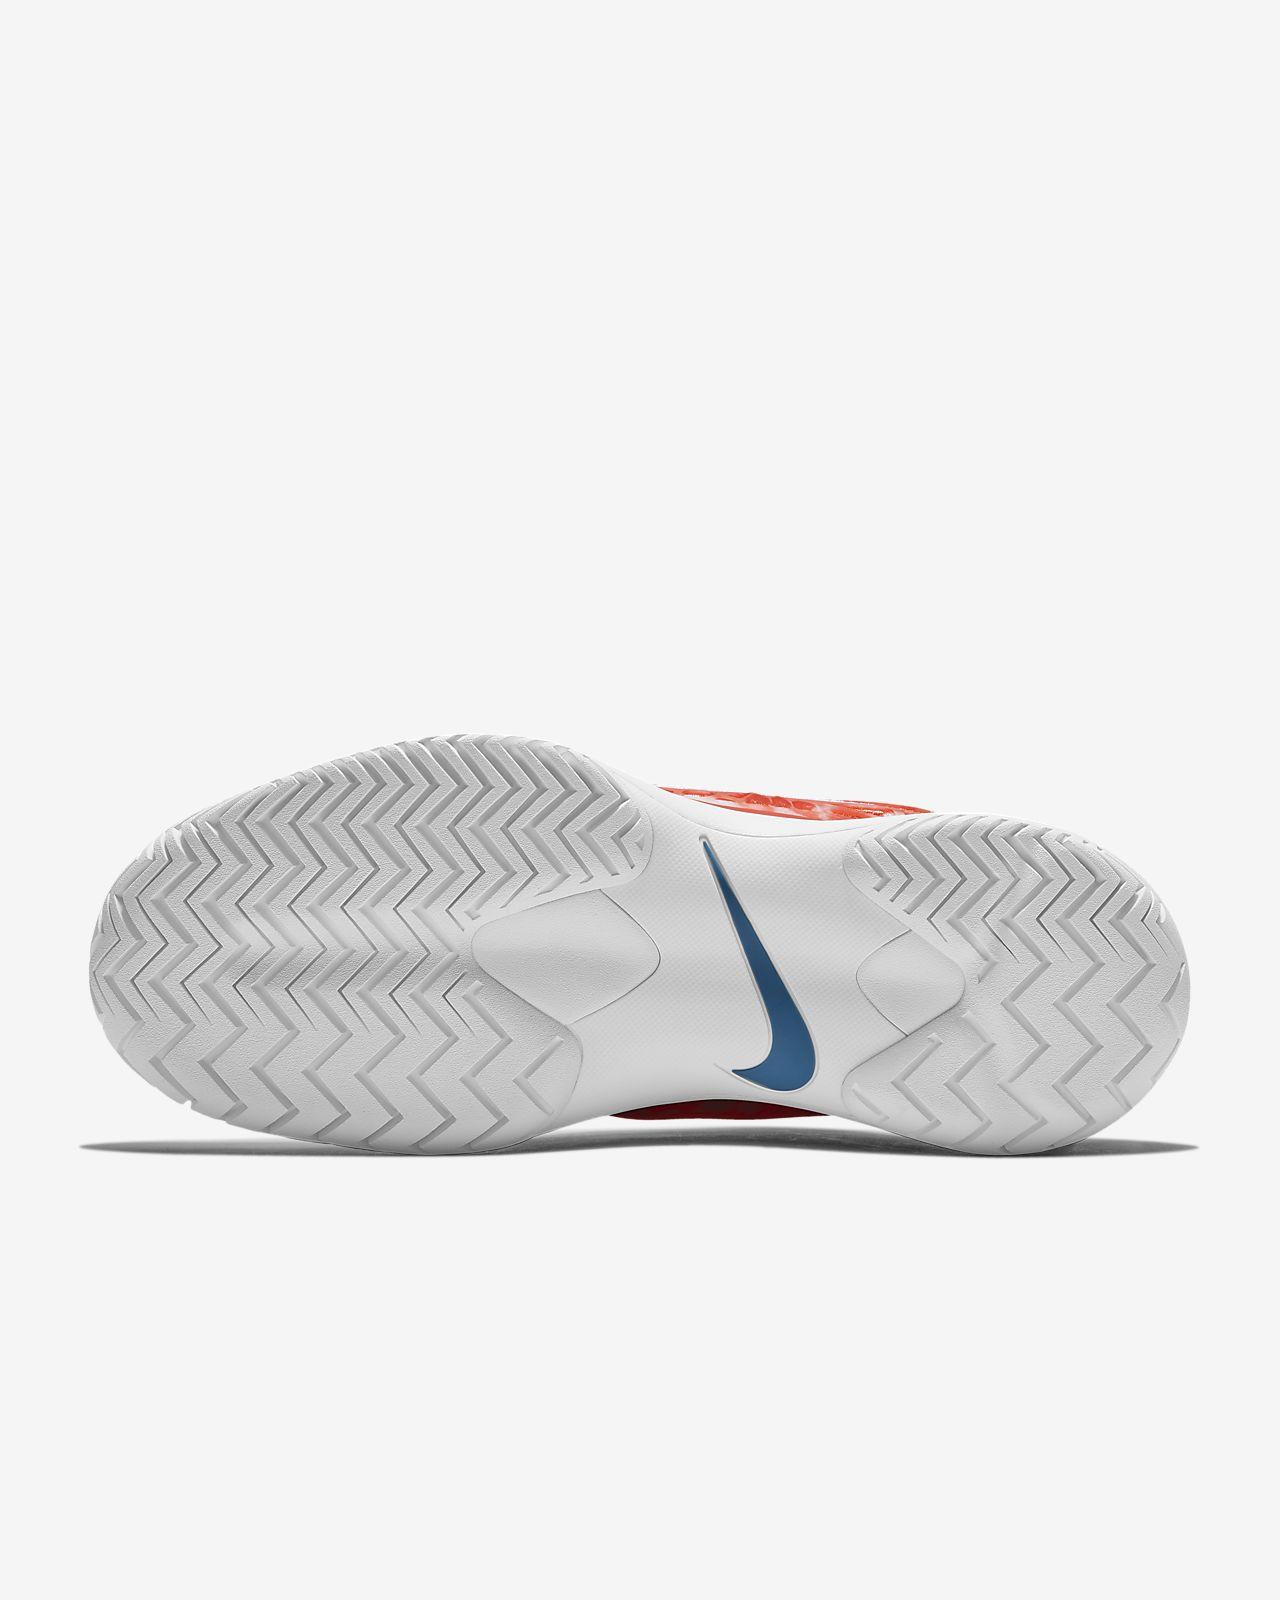 ec890e39181c7 Scarpa da tennis NikeCourt Air Zoom Cage 3 Premium - Donna. Nike.com IT